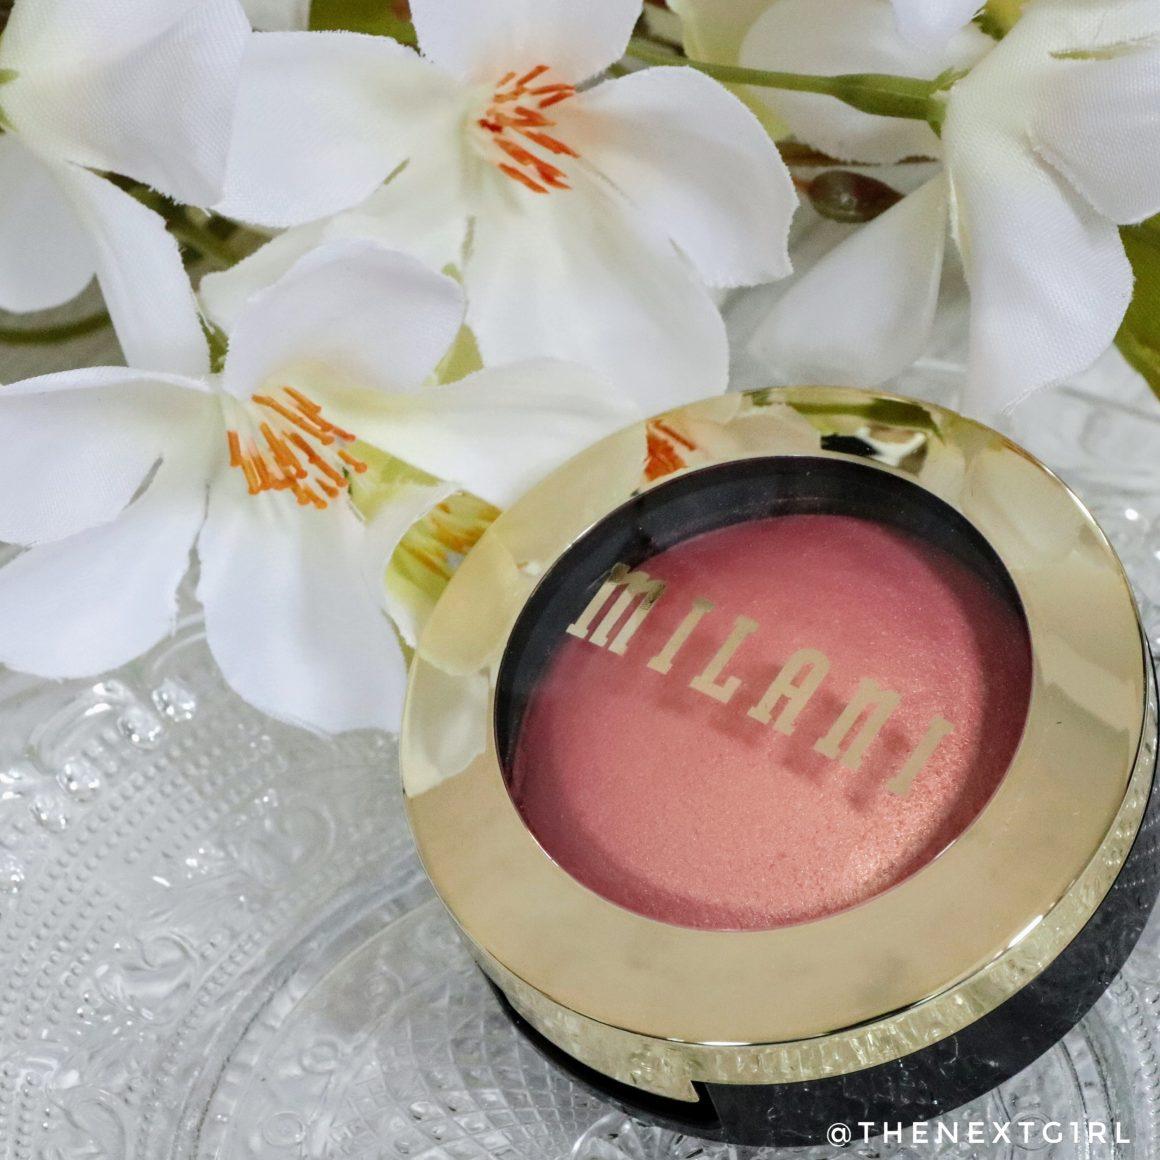 Review: Milani Bella Bellini blush